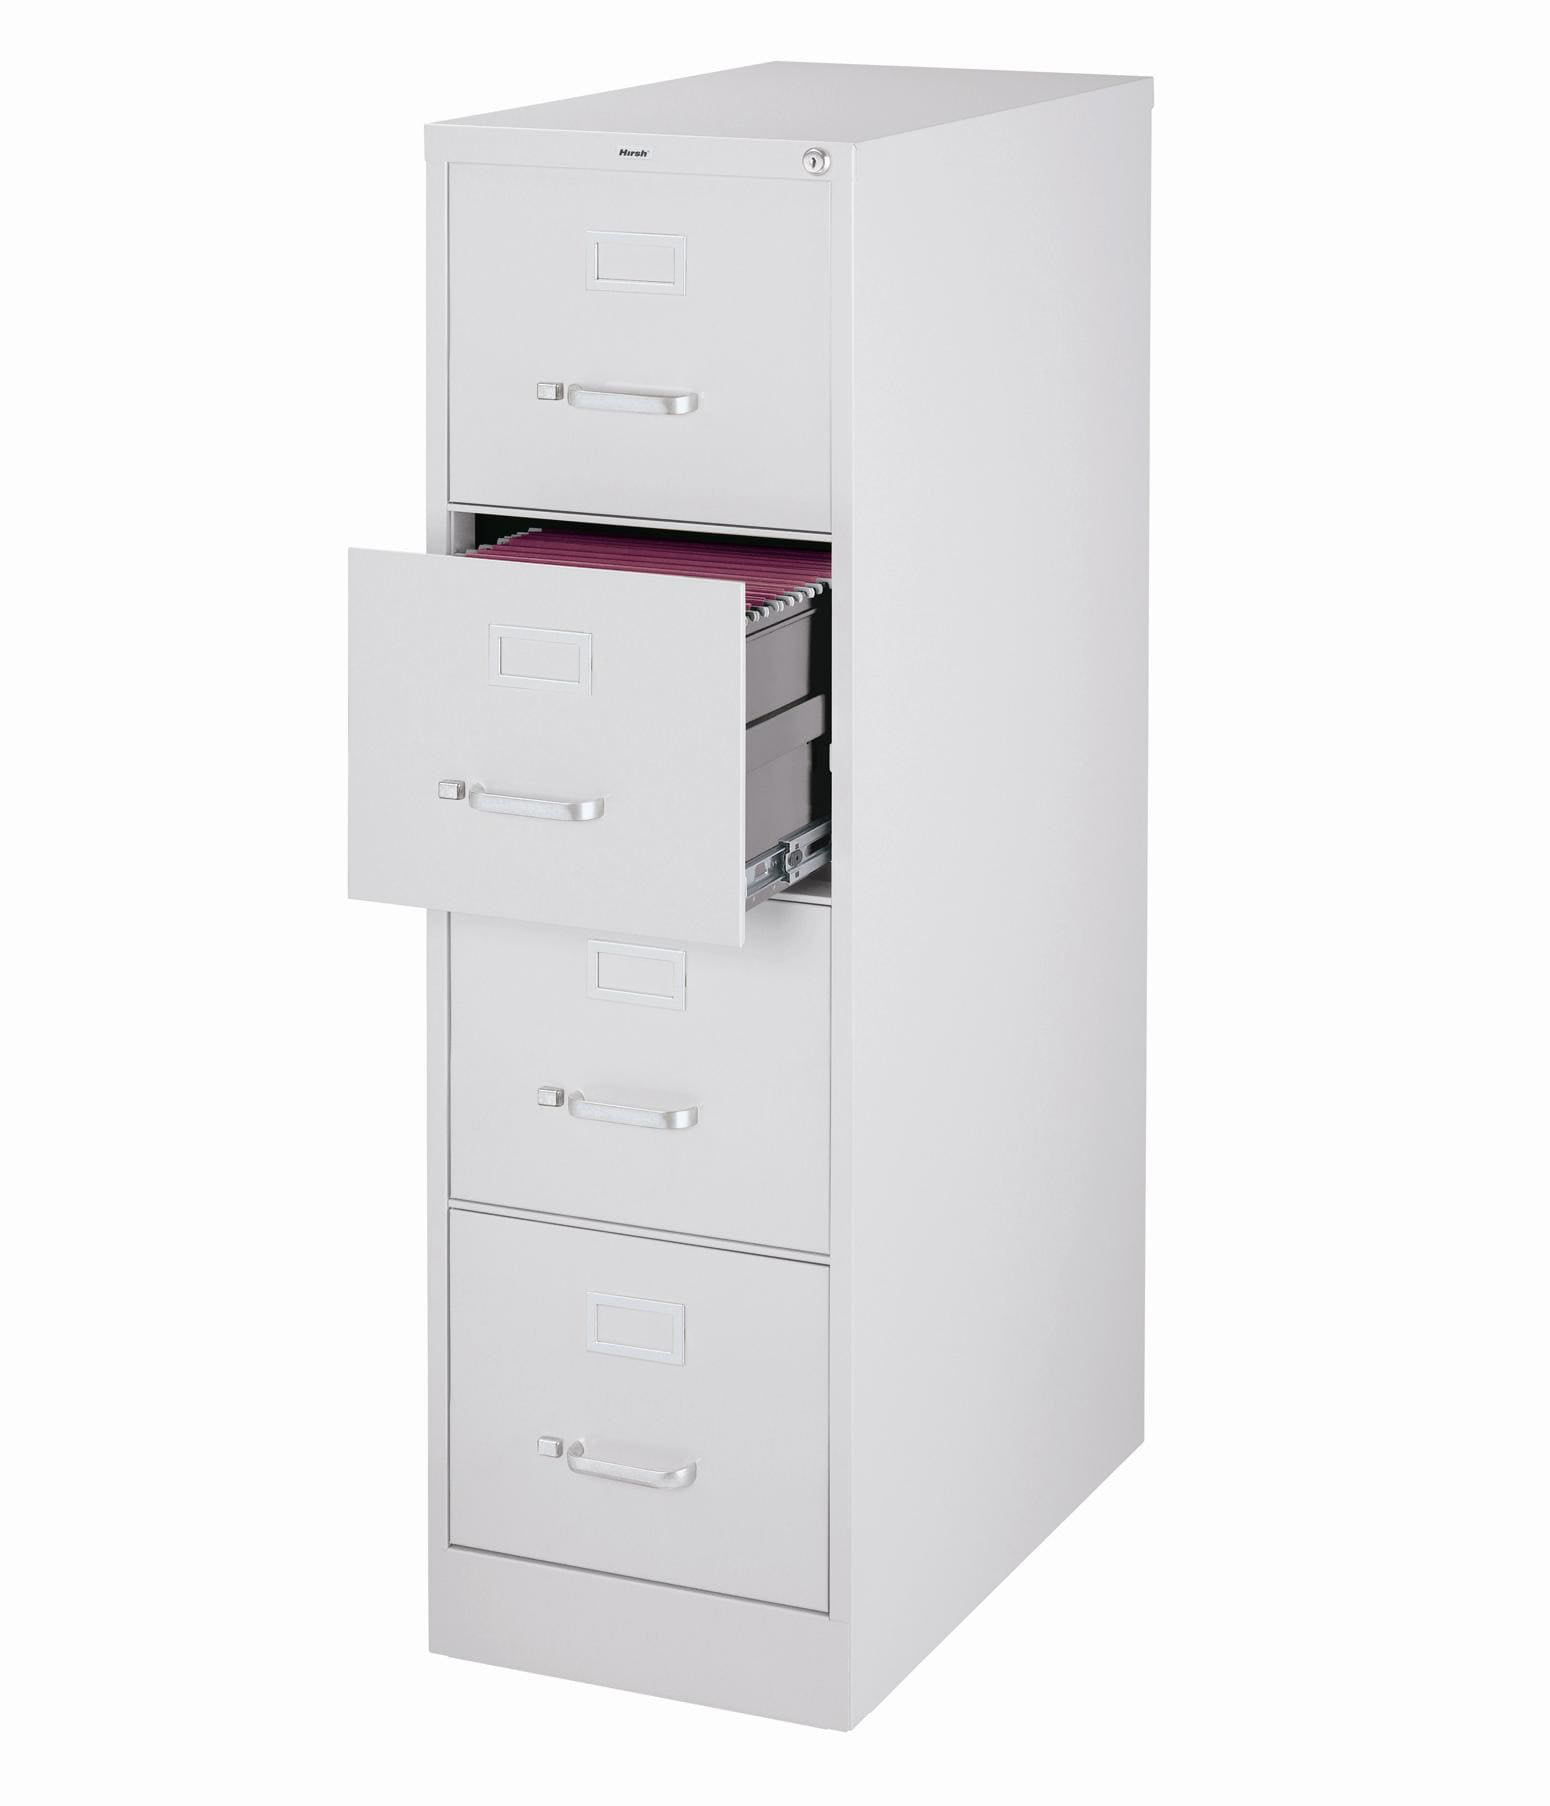 Image of: 3000 Series 26 5 Inch Deep 4 Drawer Letter Size Vertical File Cabinet Putty Walmart Com Walmart Com